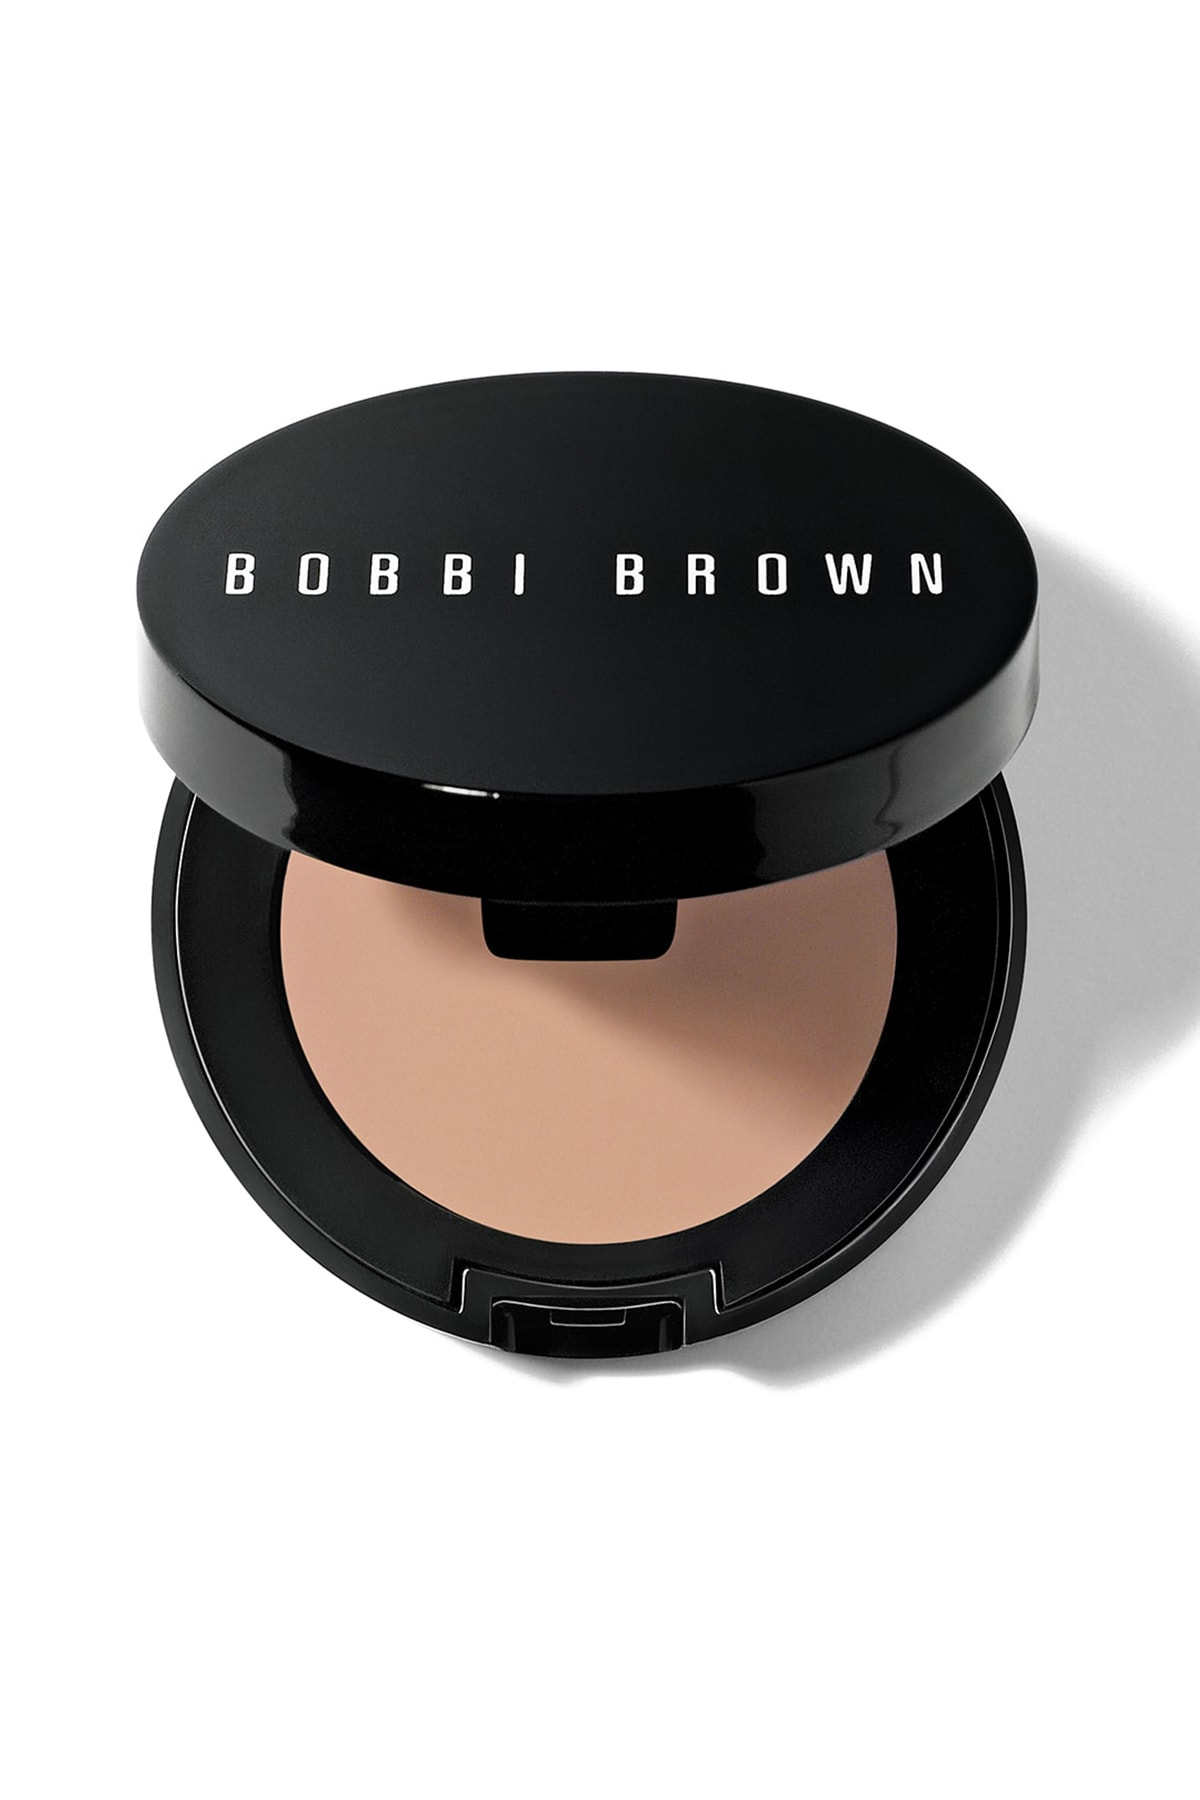 BOBBI BROWN Kapatıcı - Corrector Light Bisque 1.4 g 716170086668